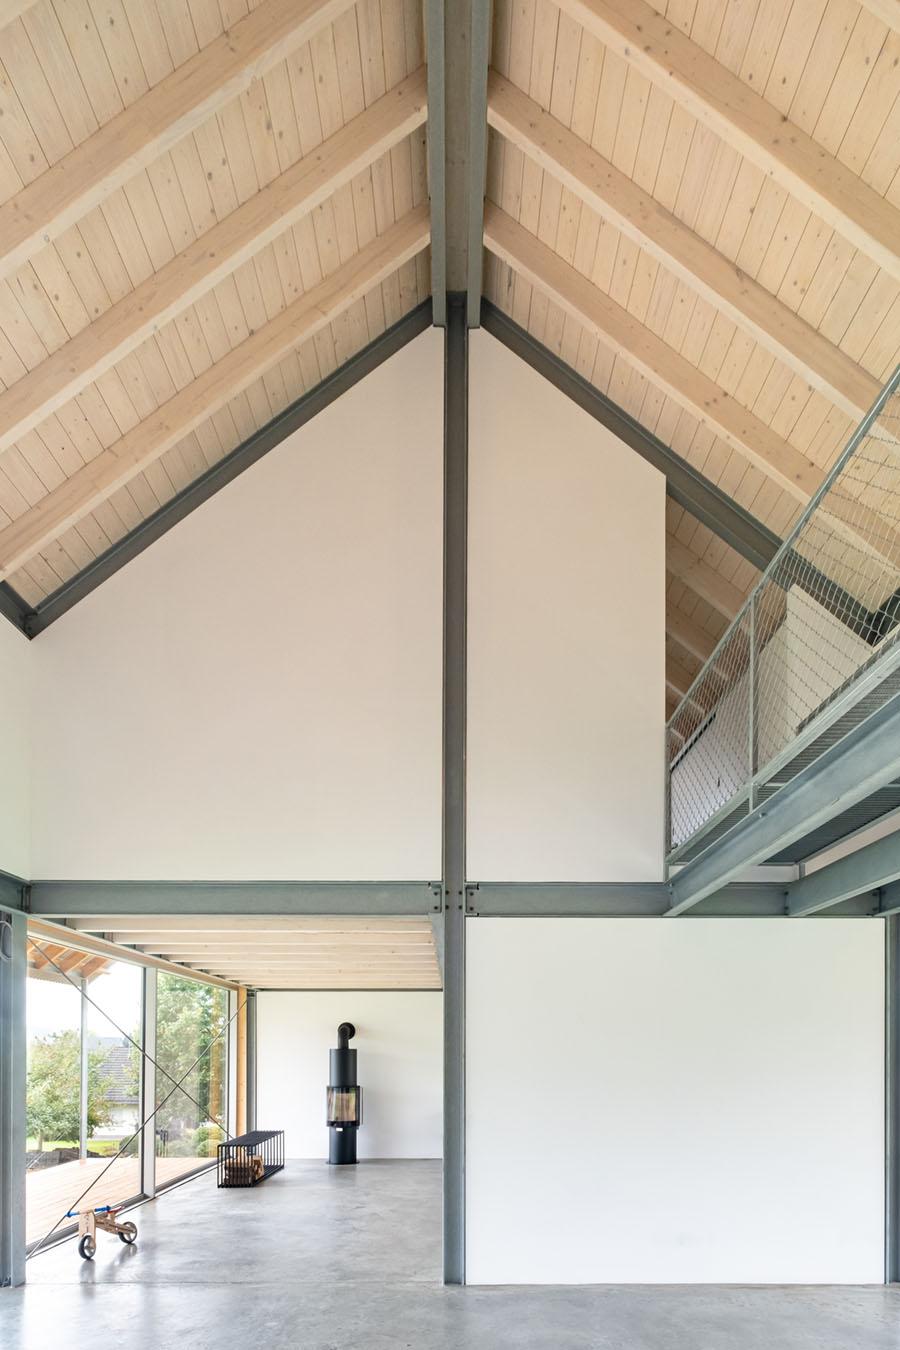 House D6 by Aretz Dürr Architektur